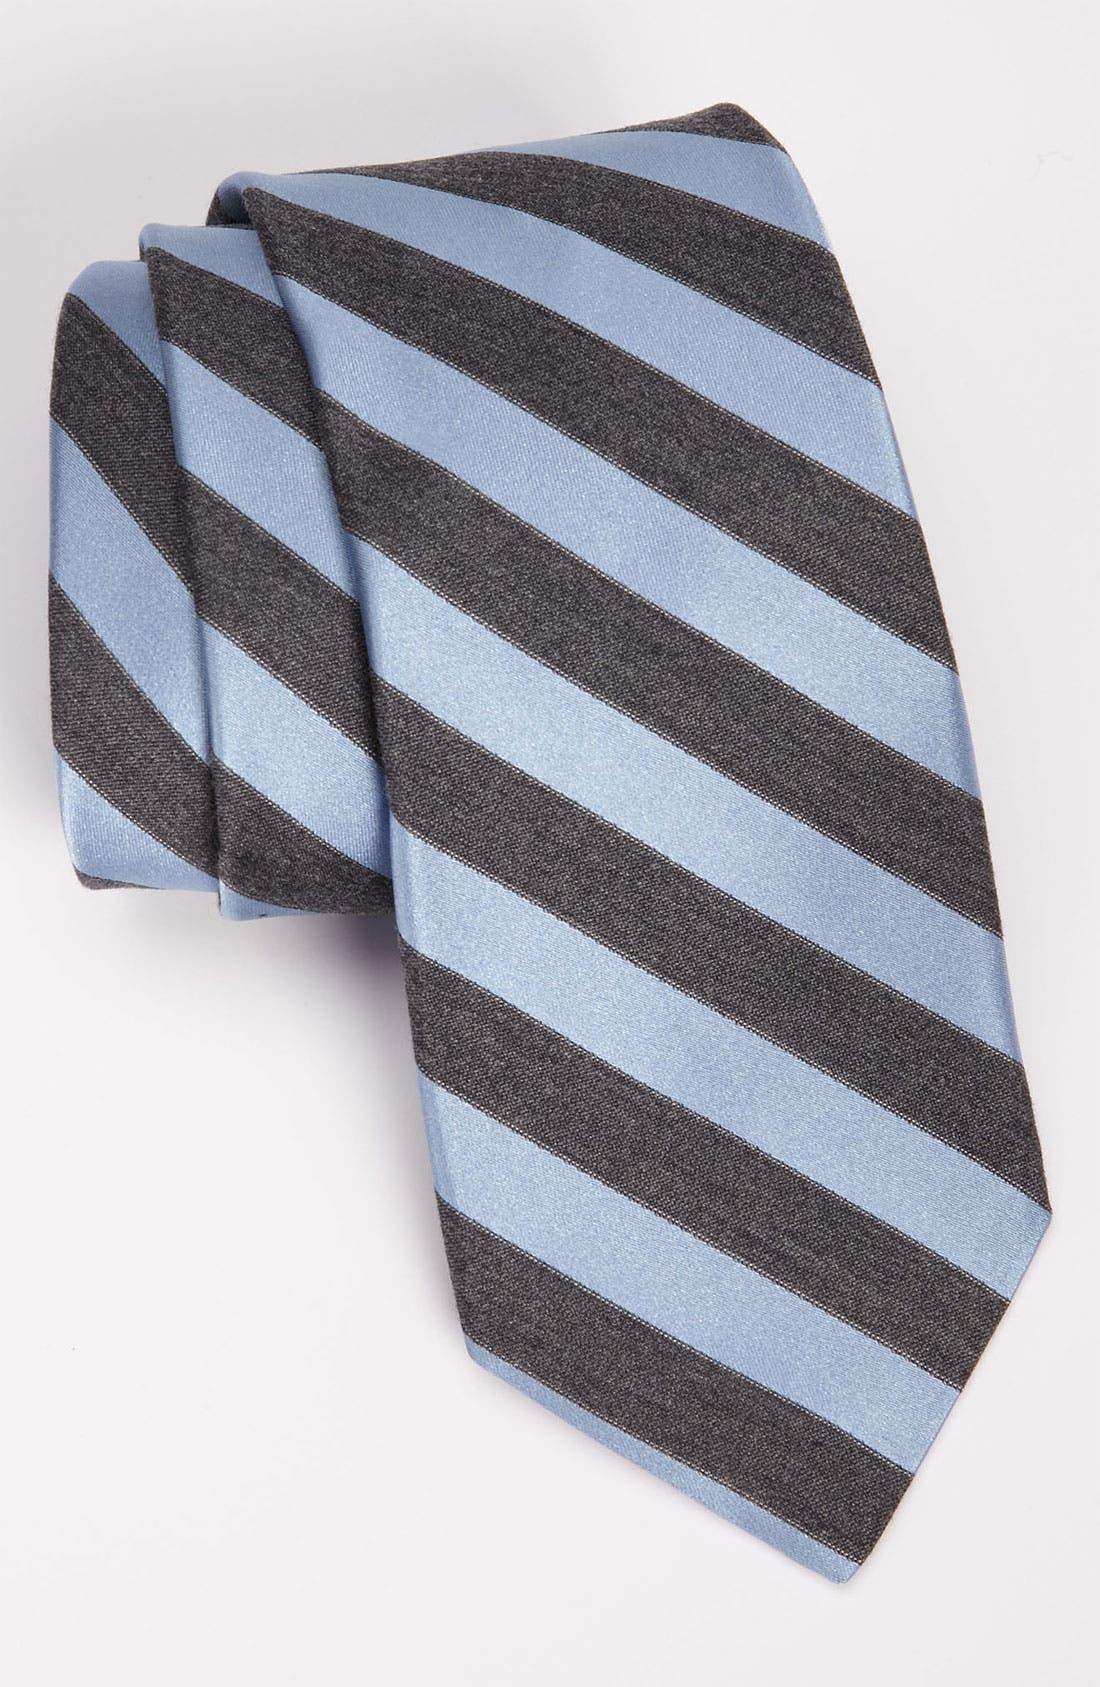 Alternate Image 1 Selected - Michael Kors Woven Tie